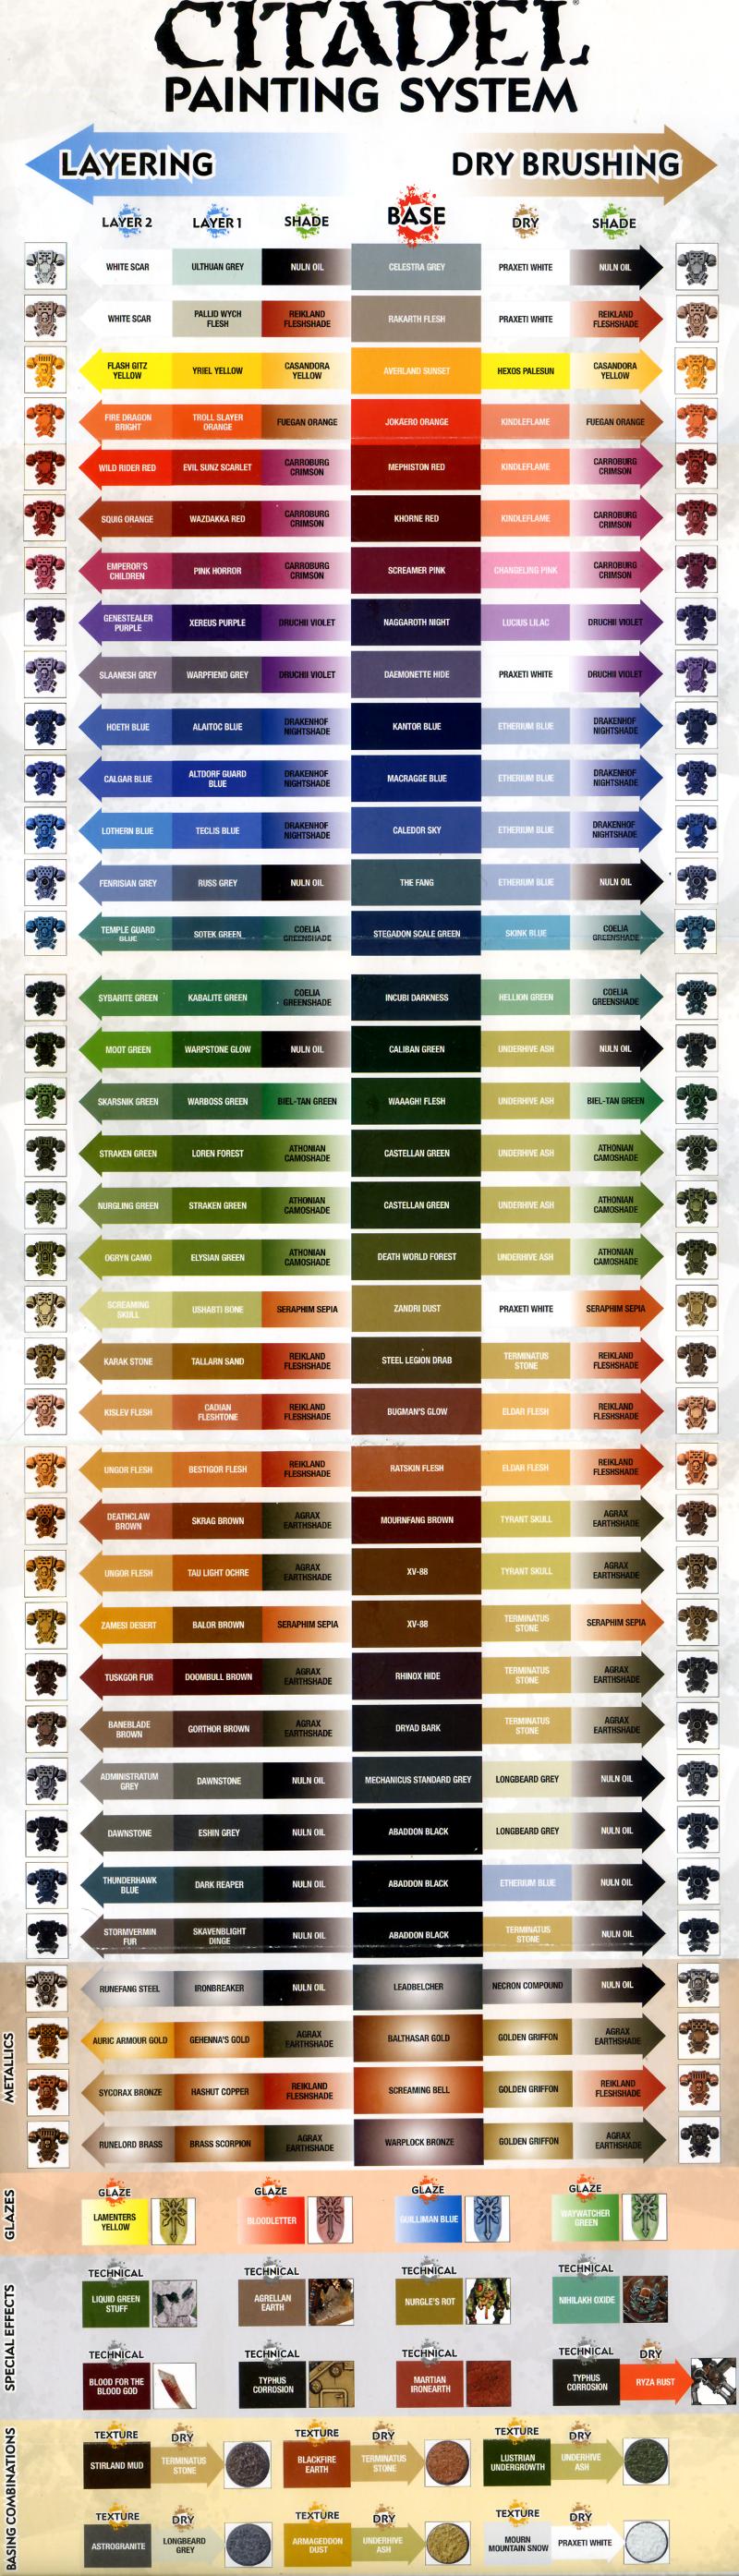 Gw Paint Chart : paint, chart, Painting, Guide,, Citadel, Chart, Gallery, Games, Workshop, Paints,, Warhammer, Paint,